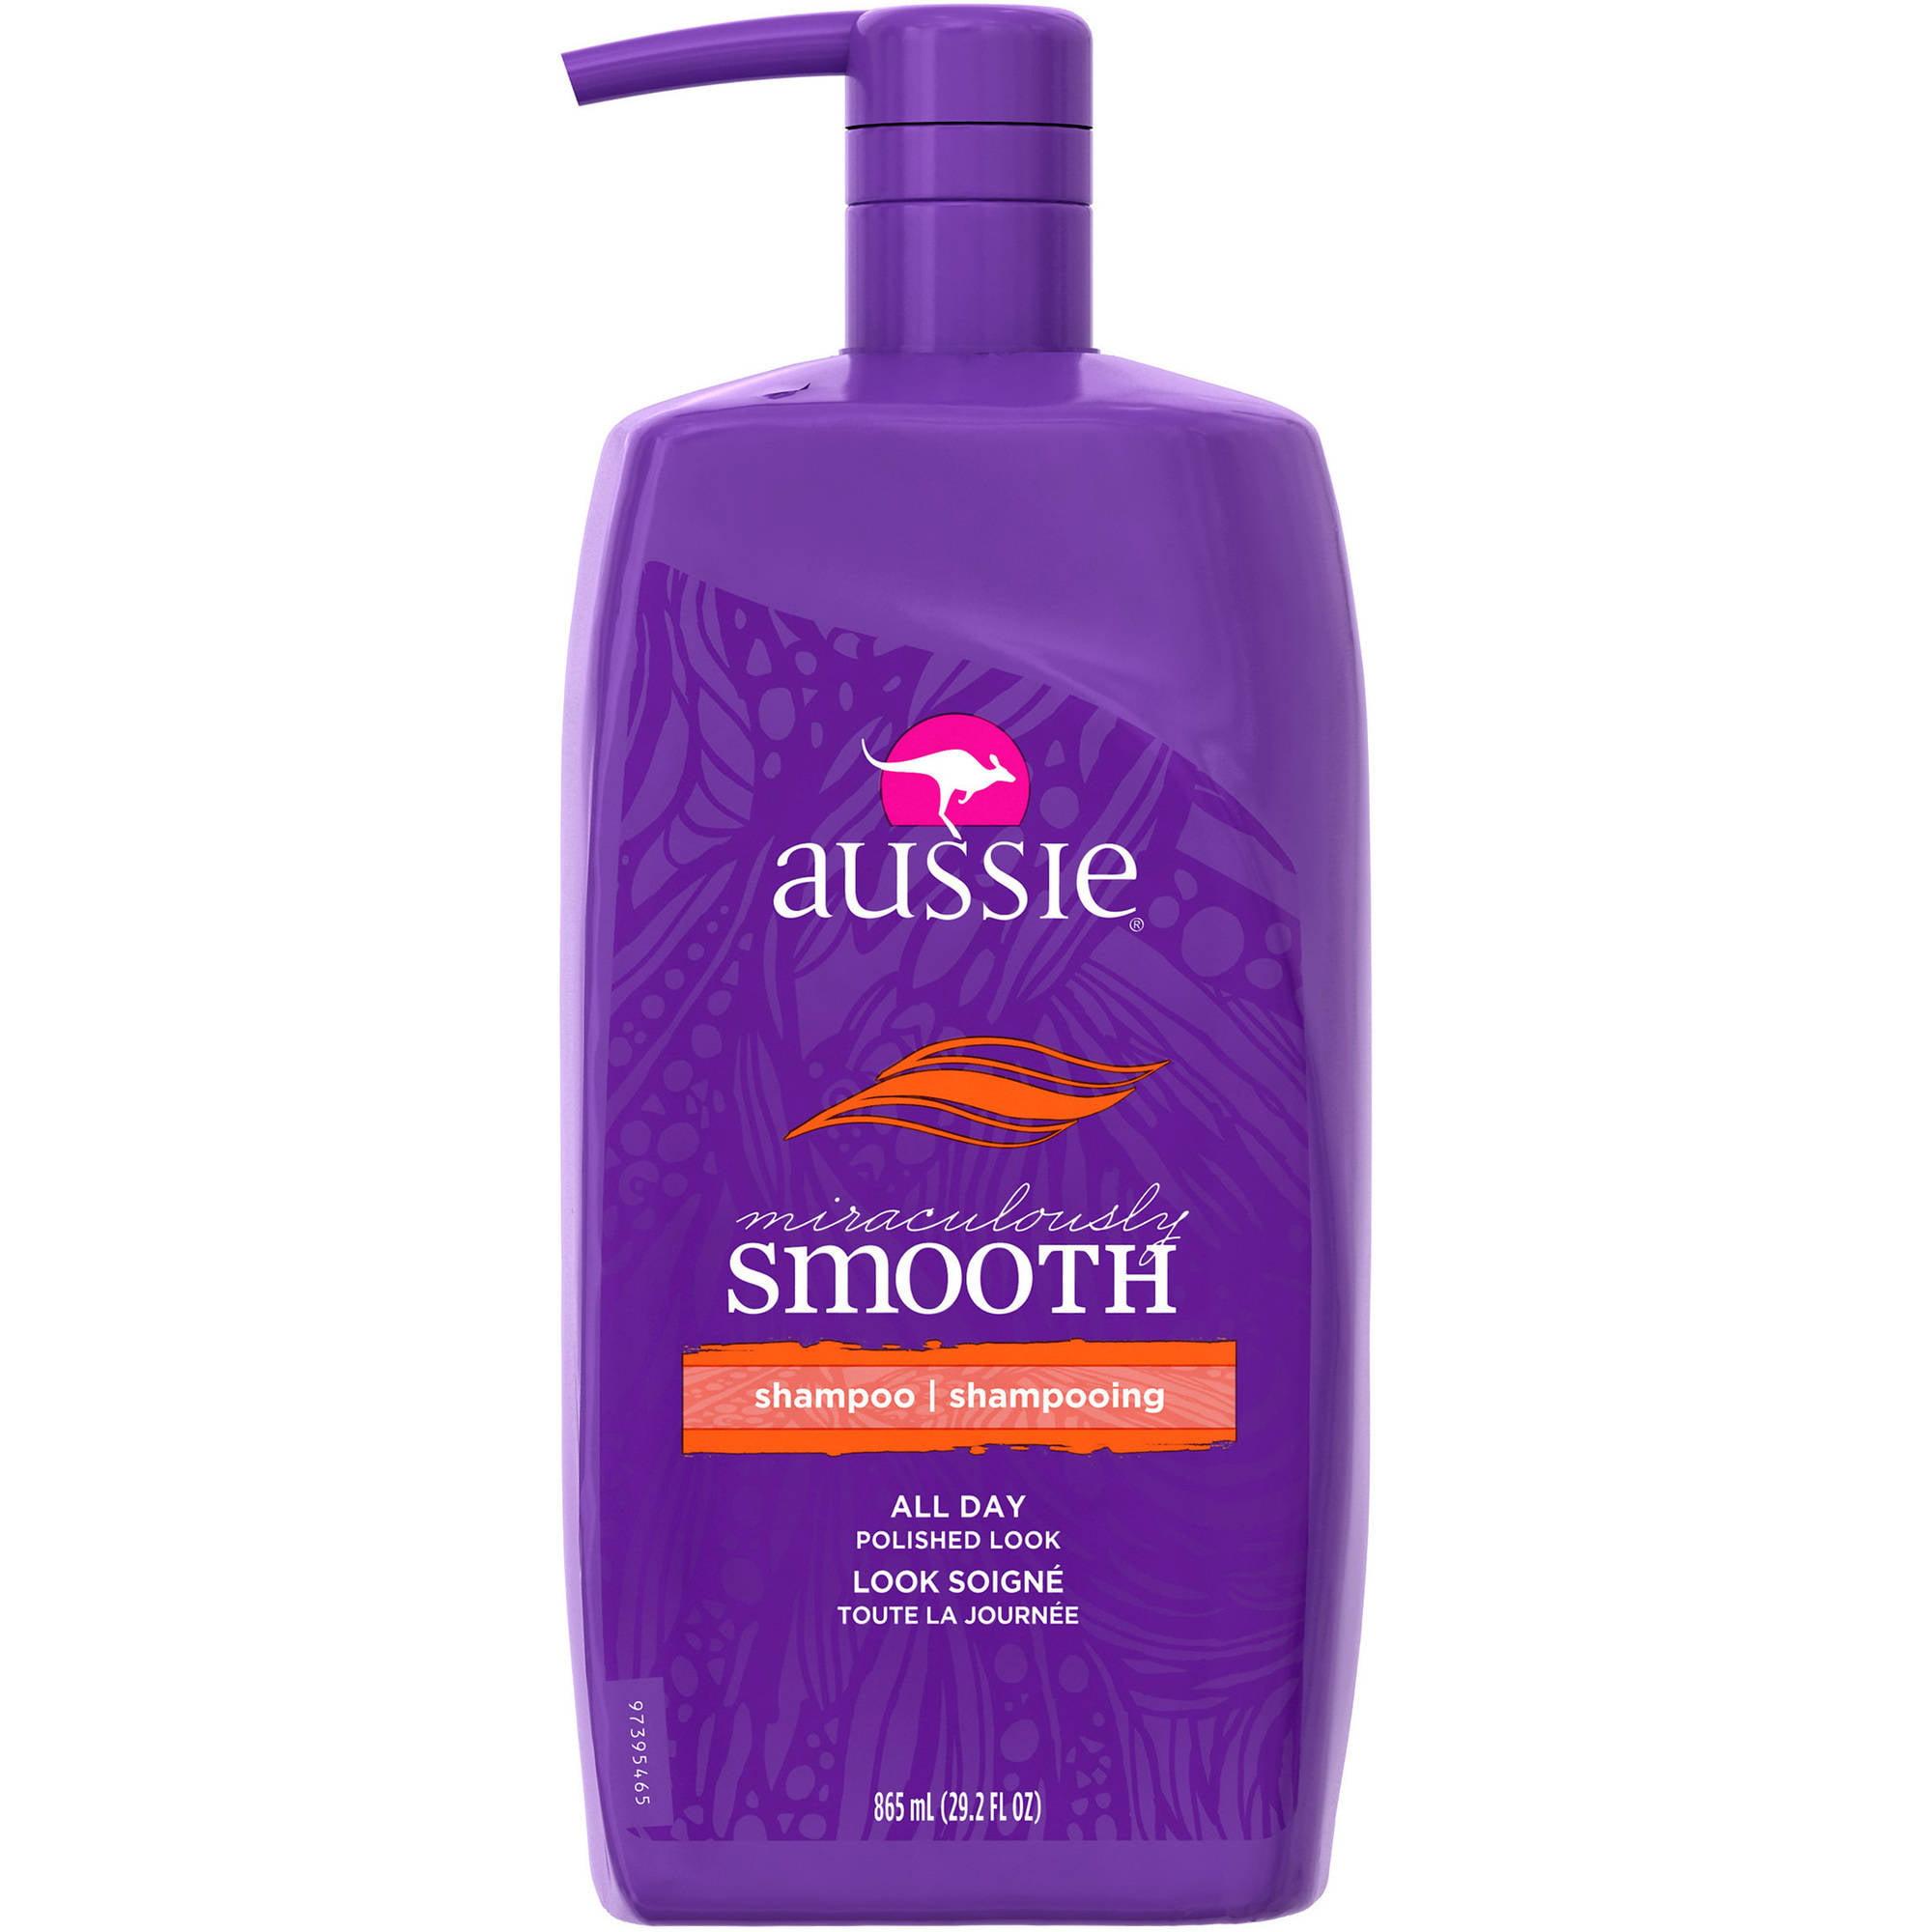 Aussie Miraculously Smooth Shampoo 29.2 Fl Oz